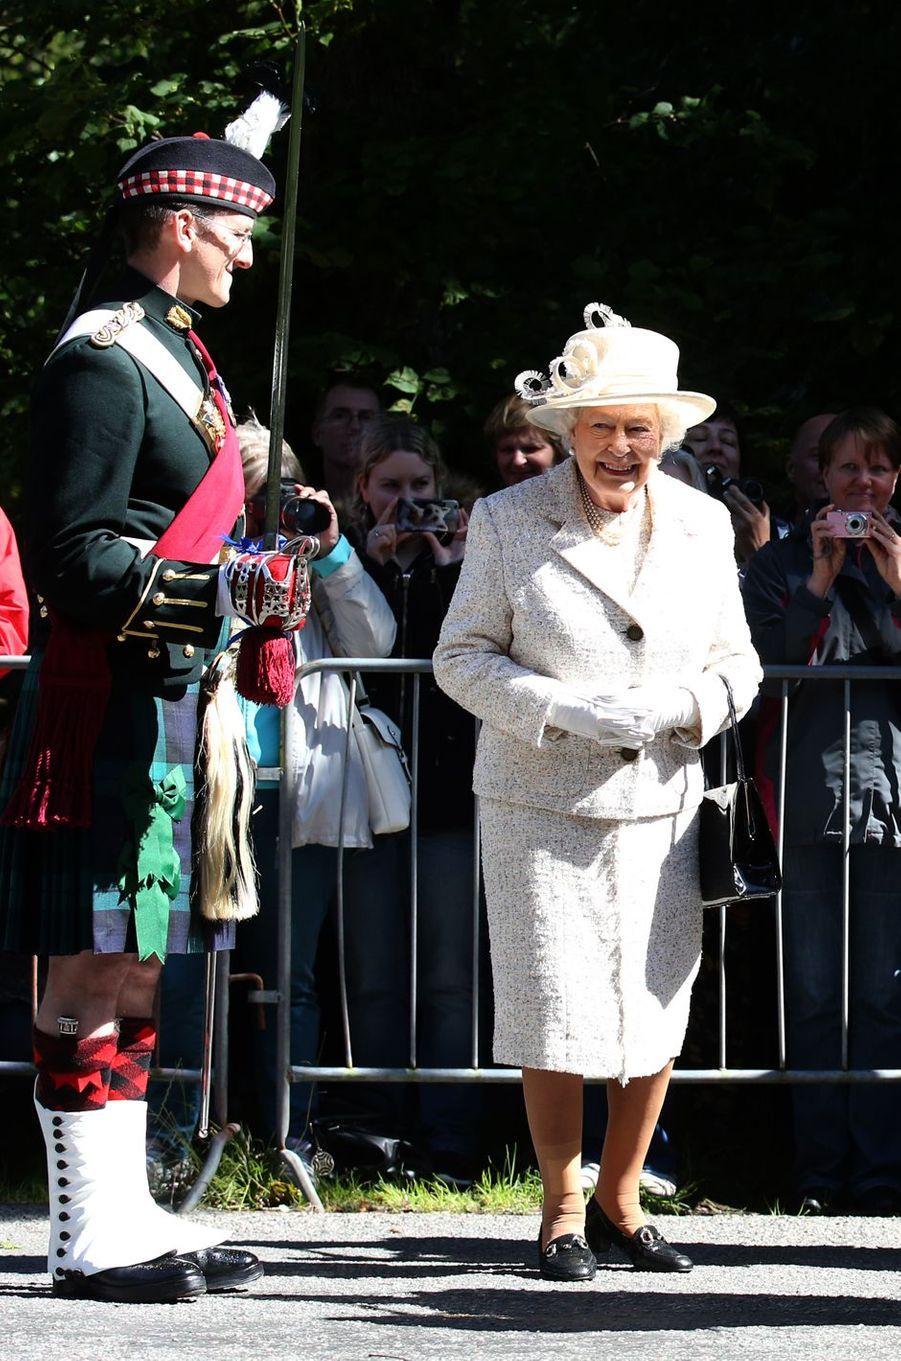 La reine Elizabeth II à Balmoral, le 8 août 2016